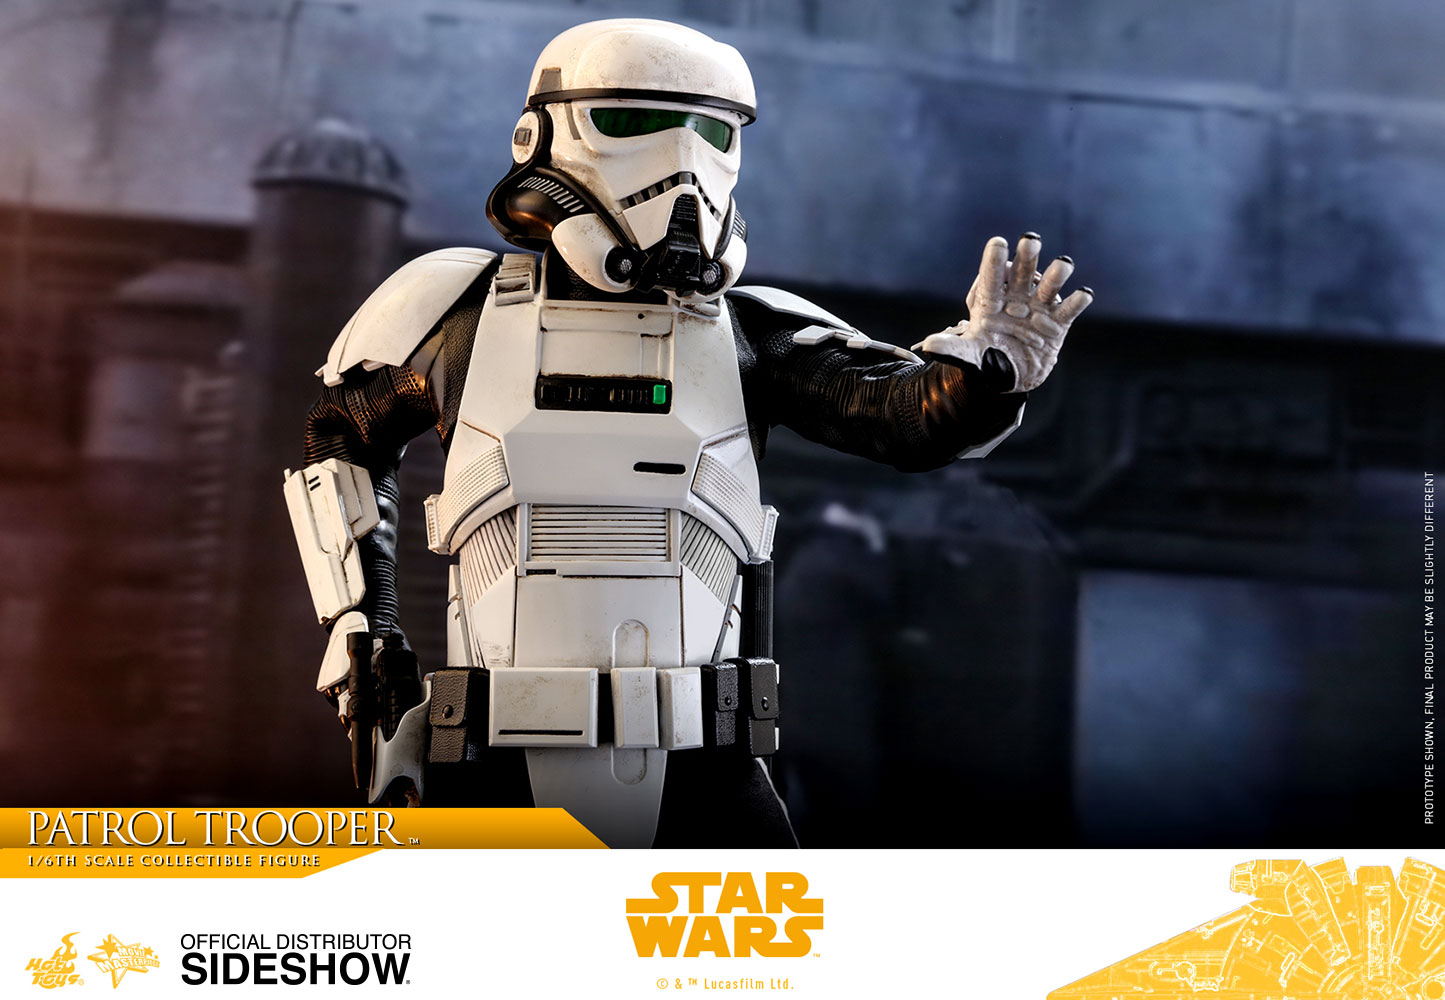 Imperial-Patrol-Trooper-sixth-scale-figure-07